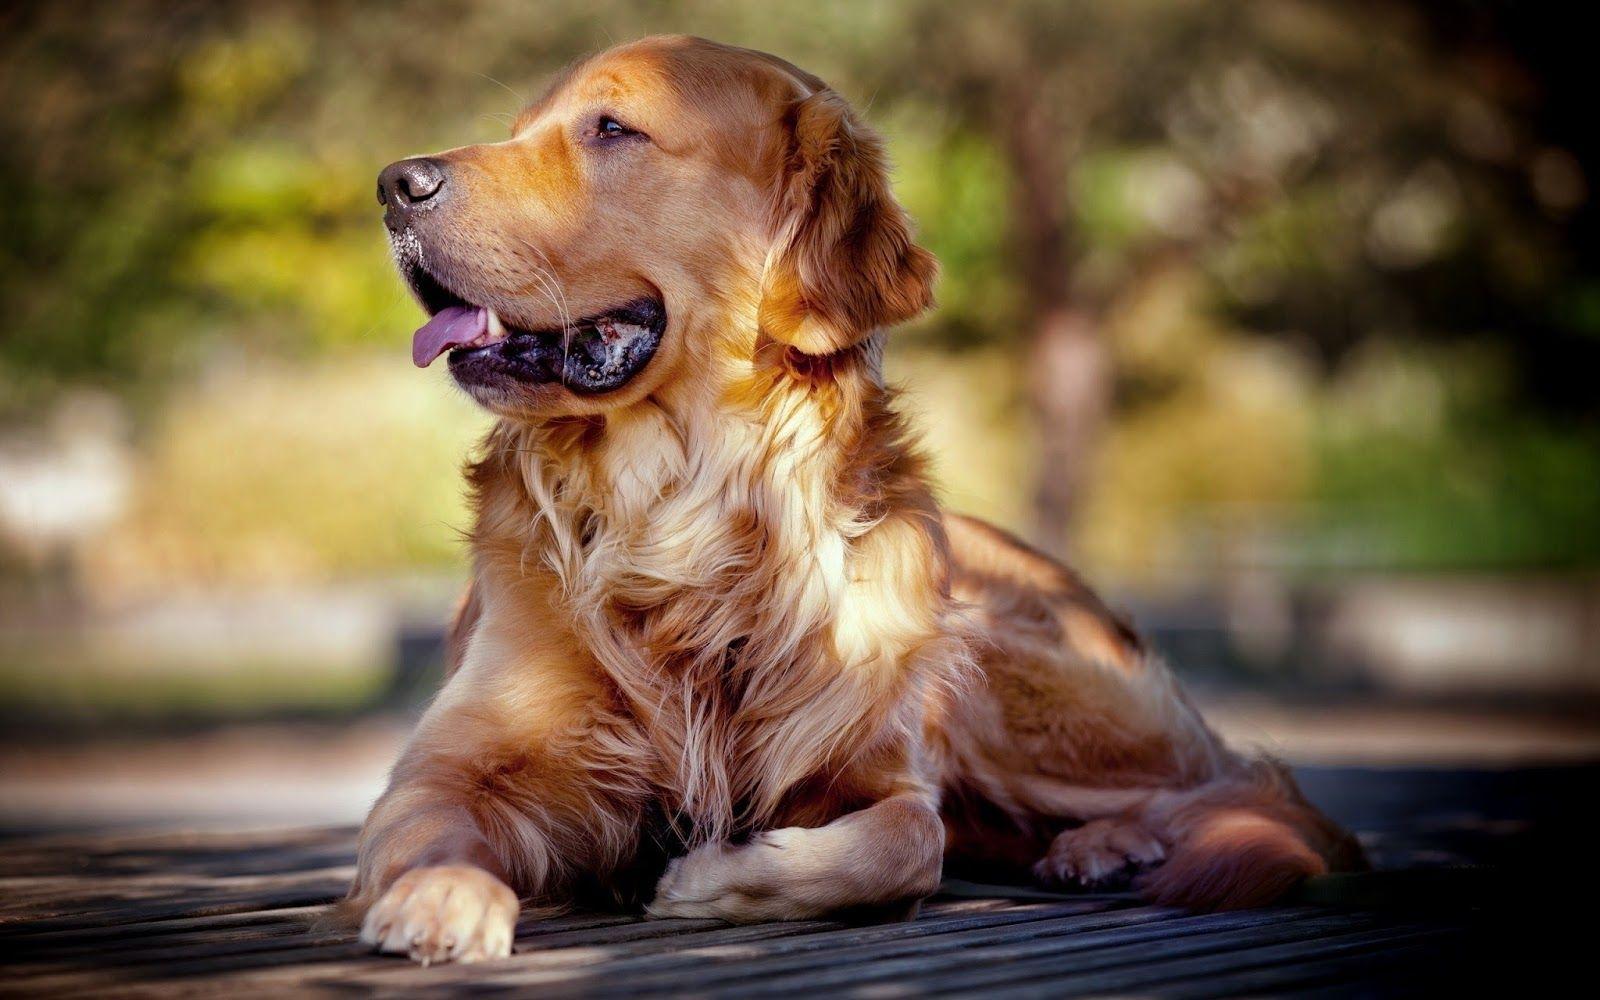 Golden Retriever Breed Profile Dogs Golden Retriever Golden